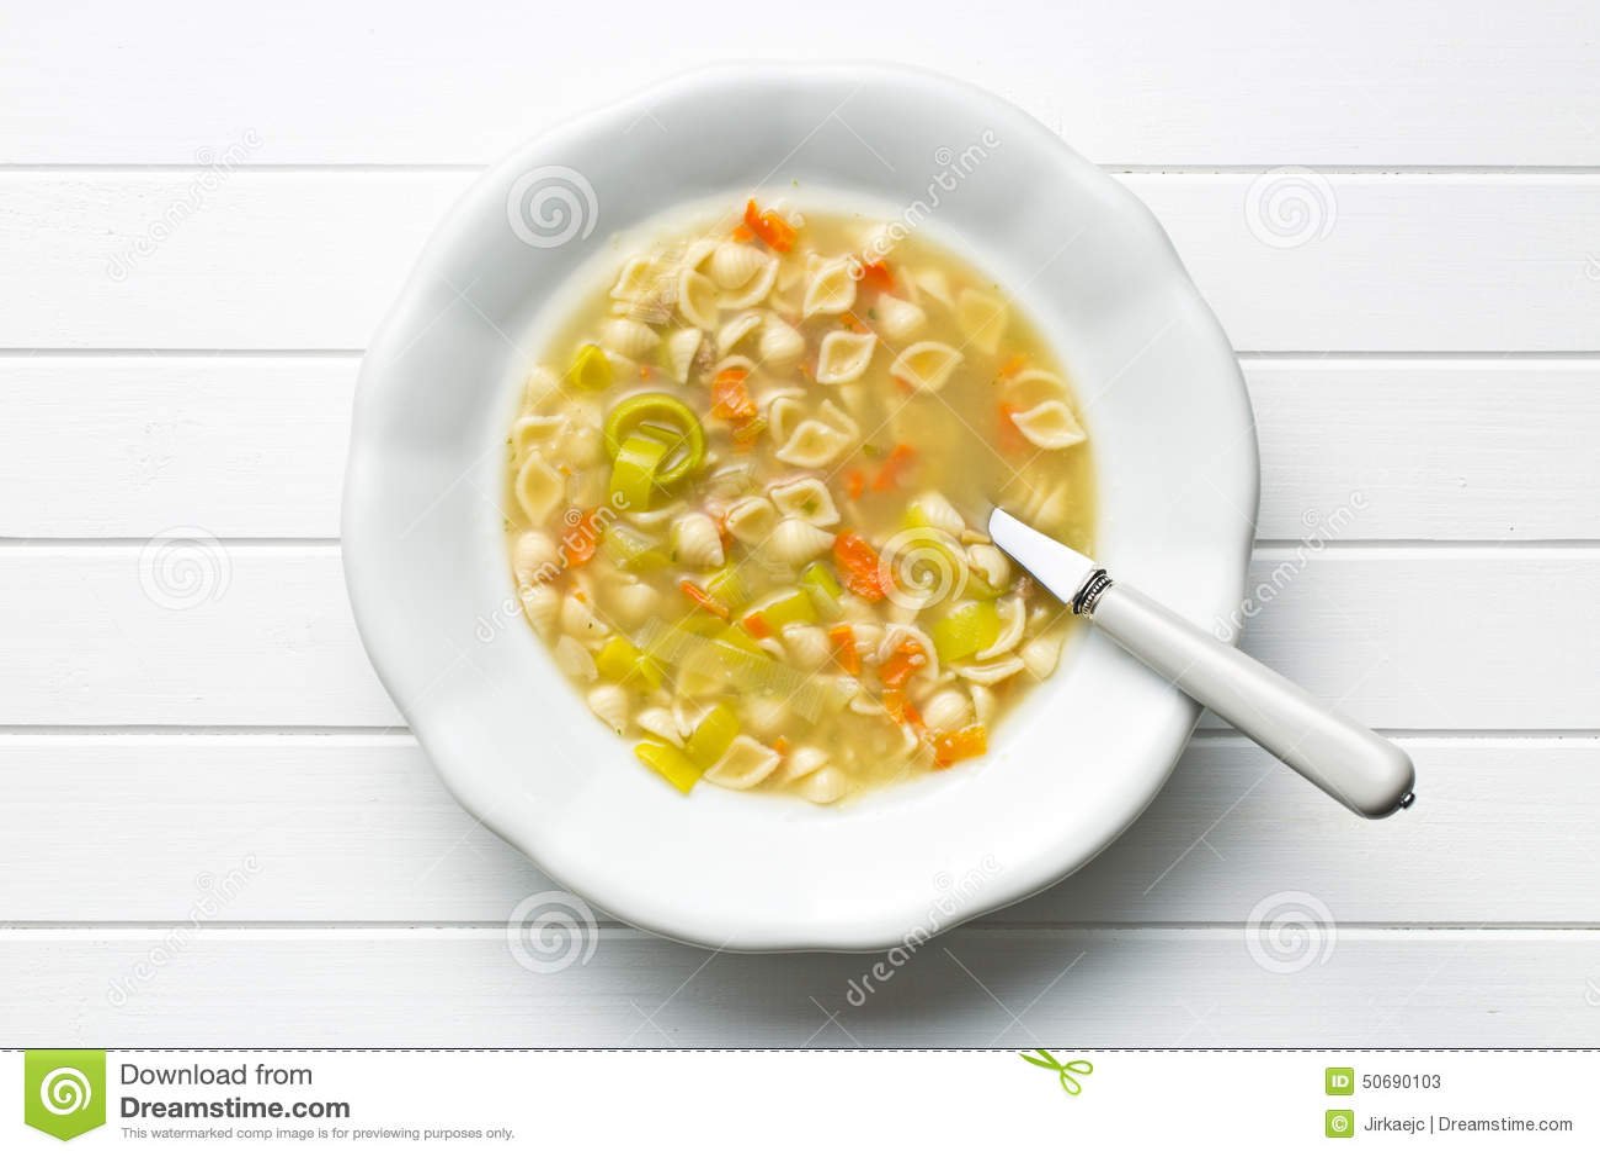 Download 与面团的蔬菜汤 库存图片. 图片 包括有 法国, 正餐, 餐馆, 牌照, 鲜美, 新鲜, 营养, 饮食, 工作室 - 50690103